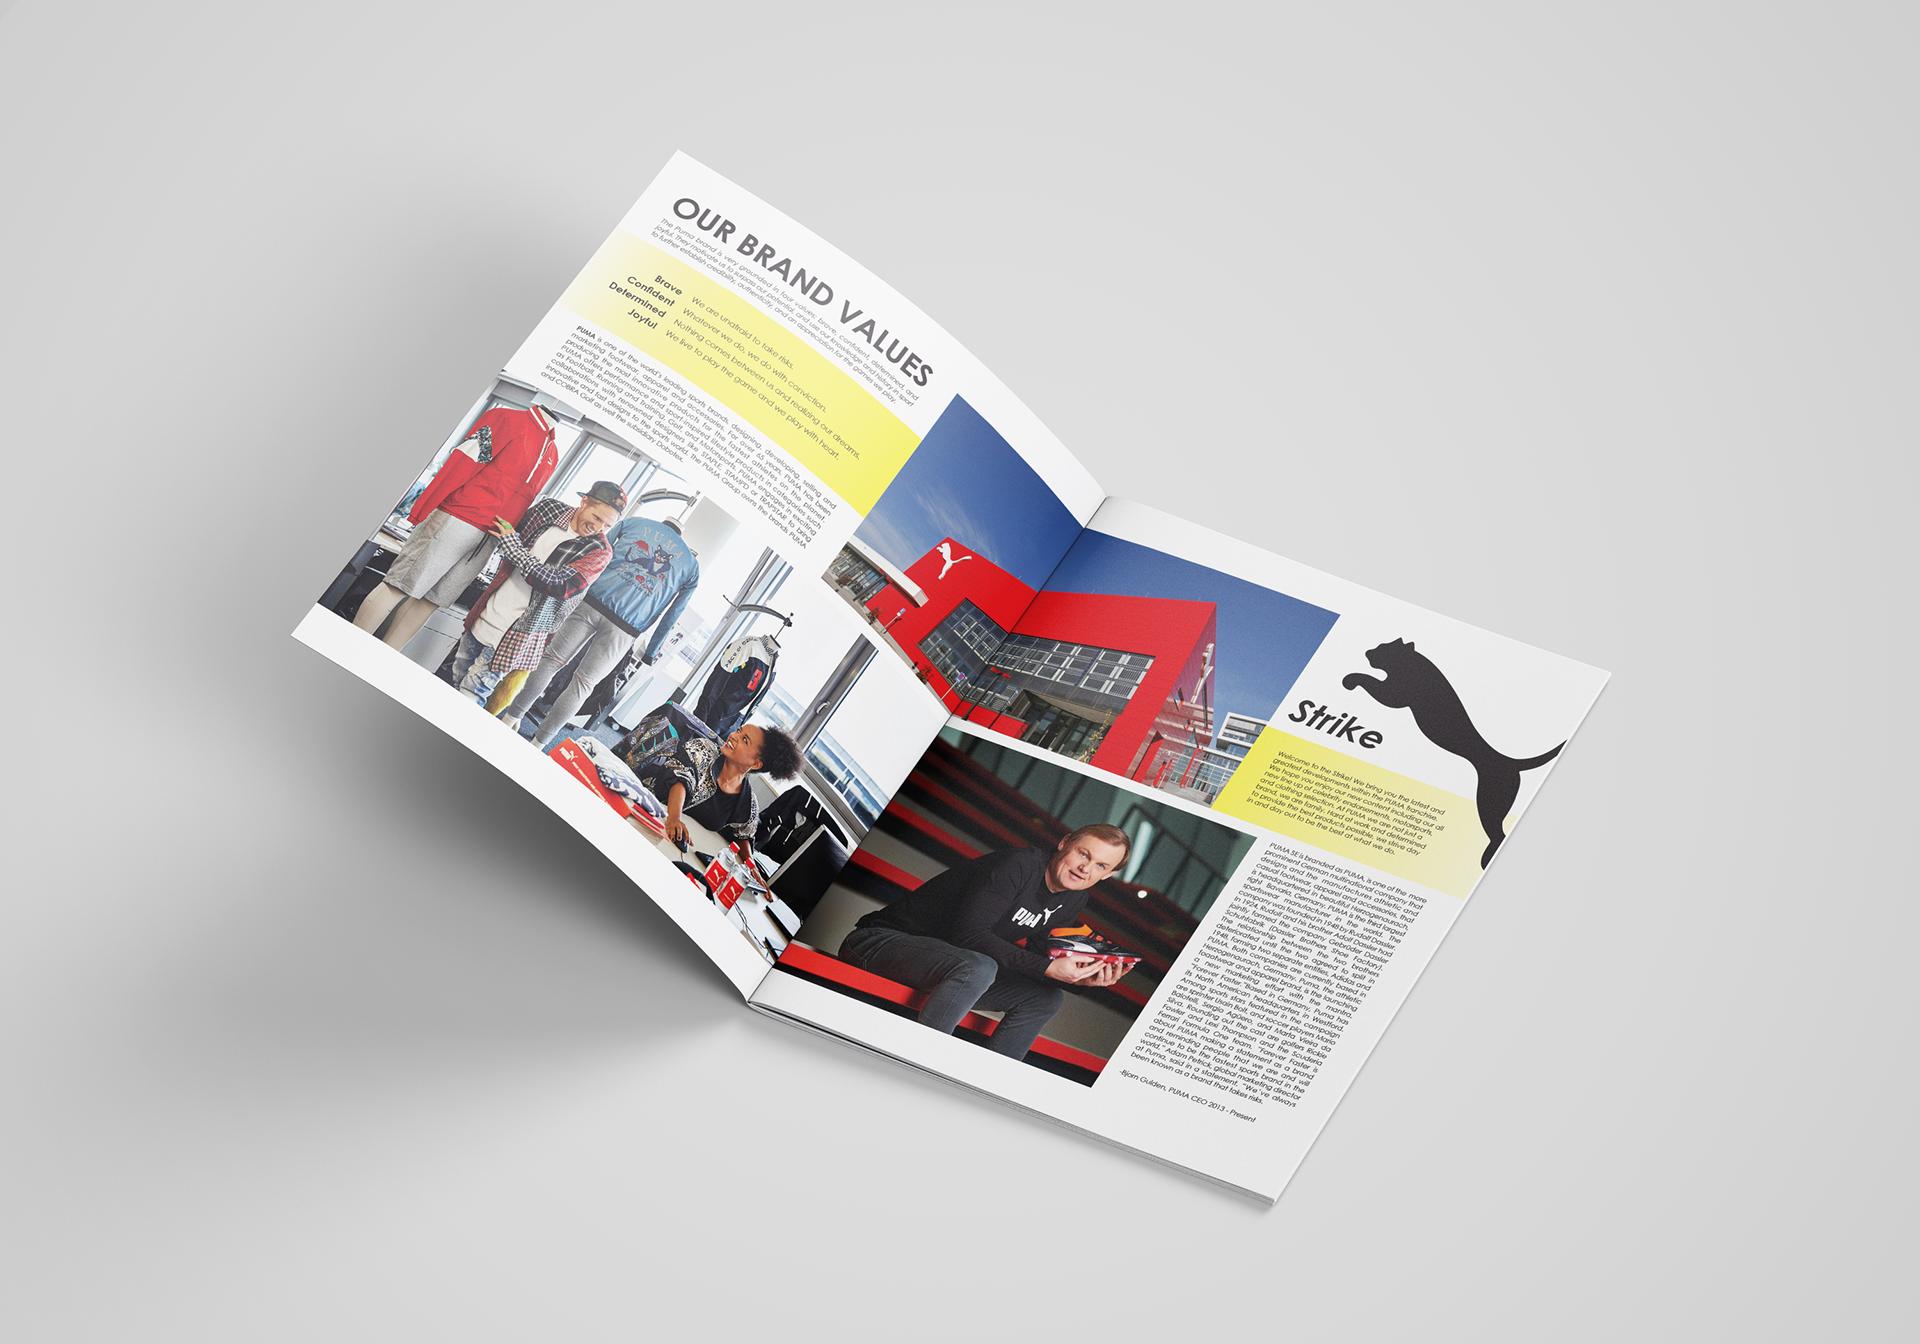 sugerir Ciro Subproducto  DWKN creative - Puma Newsletter